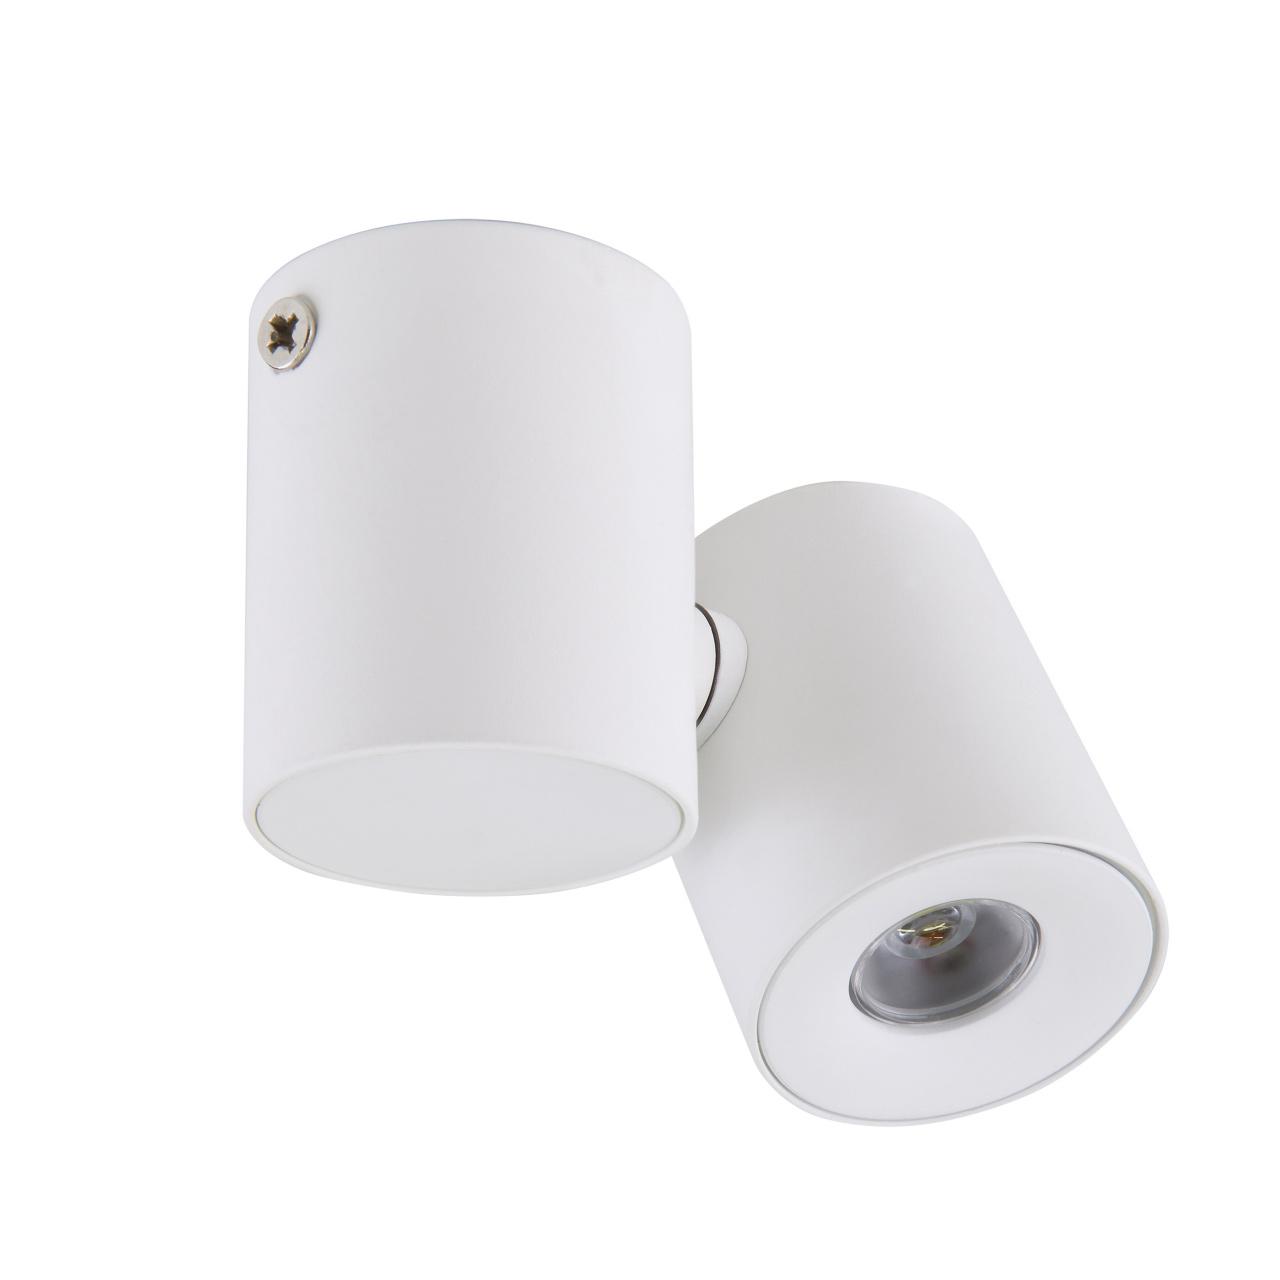 Светильник Punto LED 3W 190LM 20G белый 4000K IP40 Lightstar 051126